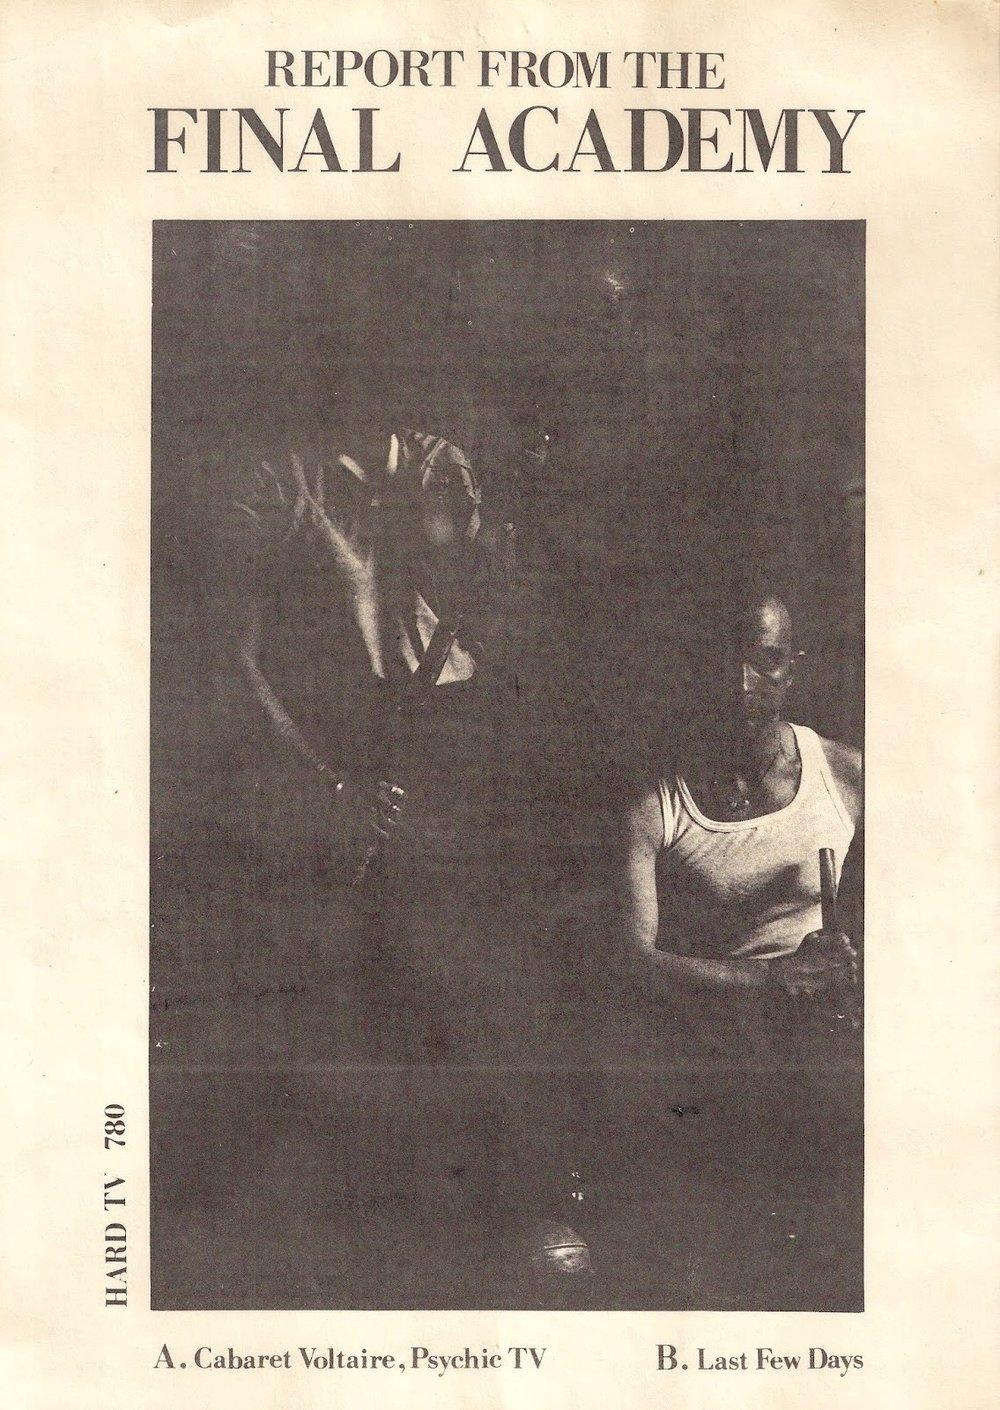 Cabaret Voltaire, Psychic TV y Last Few Days, 1982